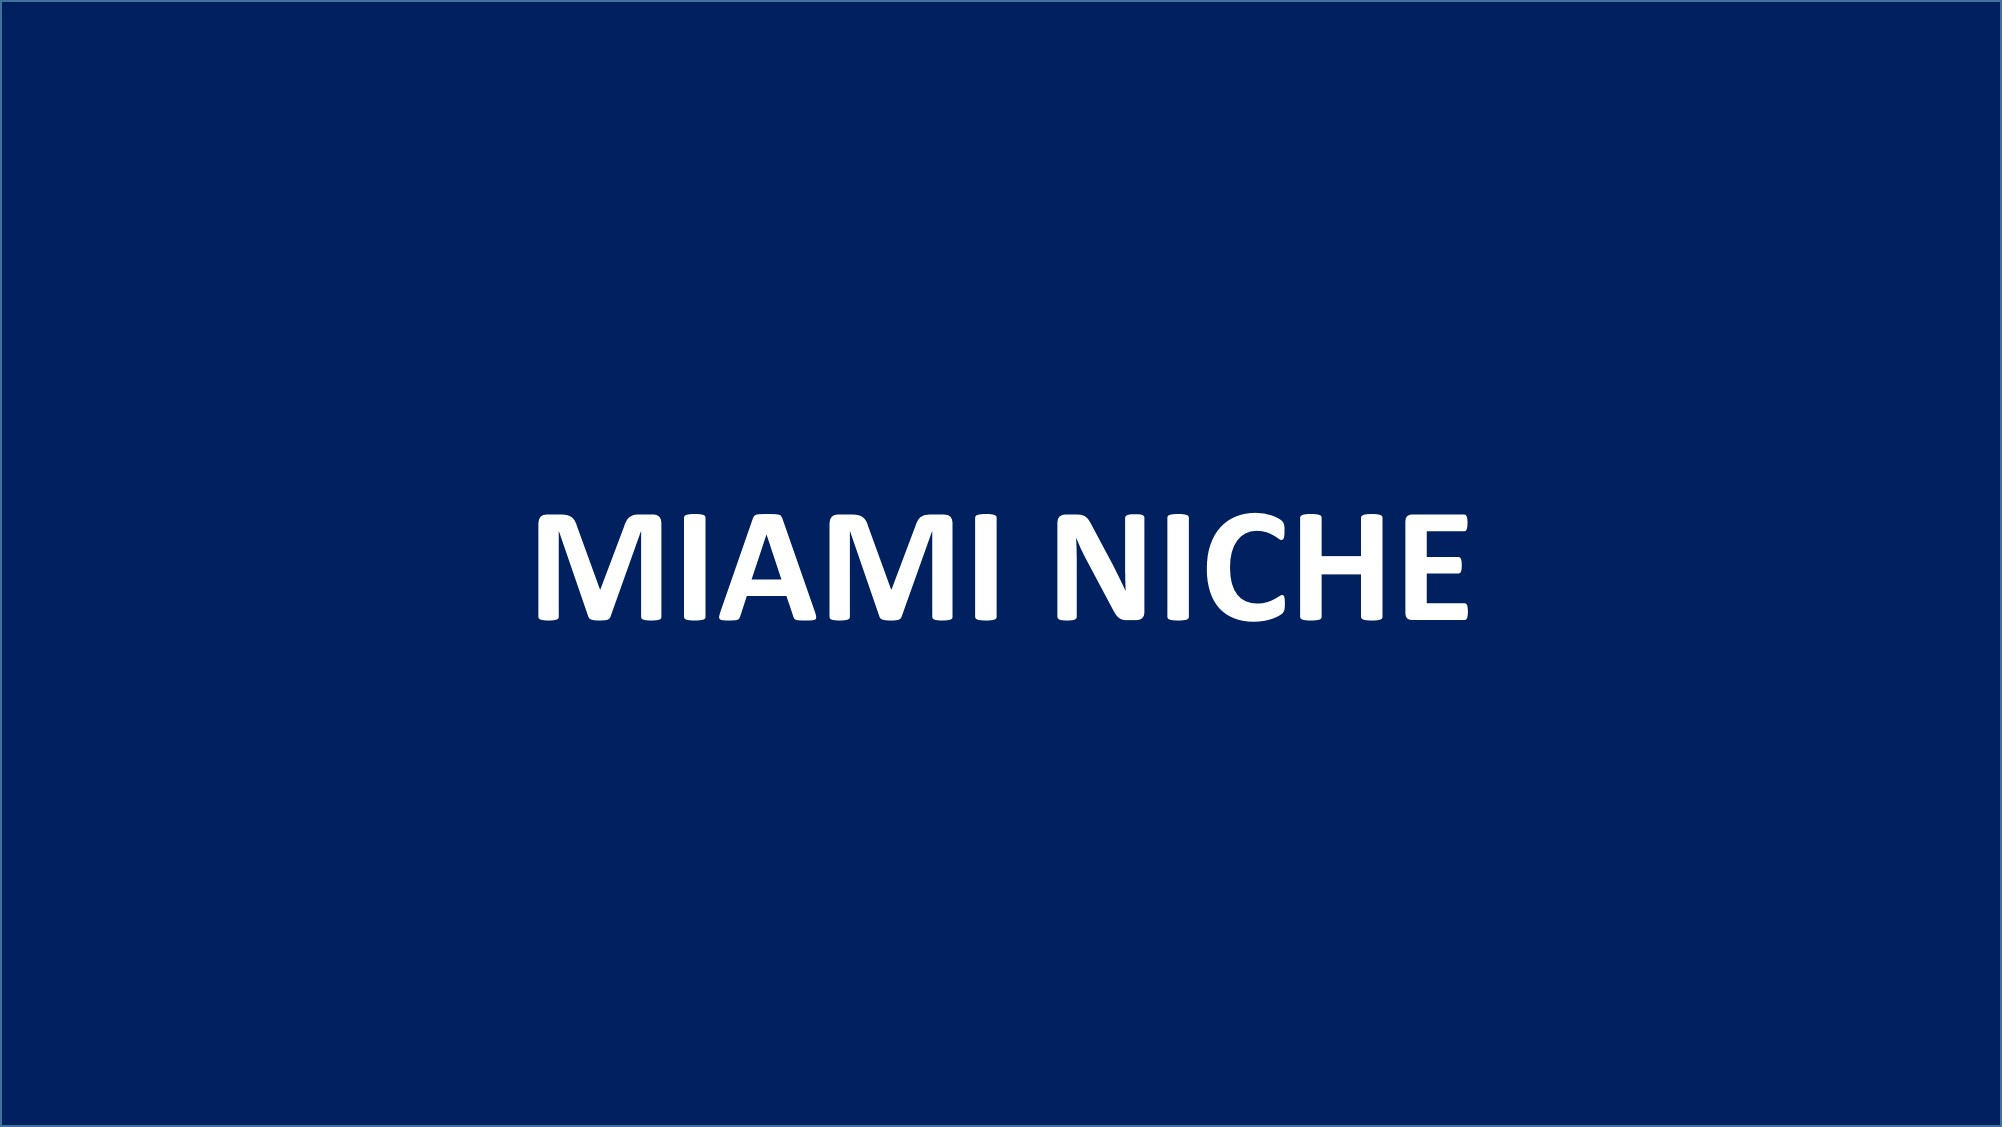 Miami Niche logo.jpg